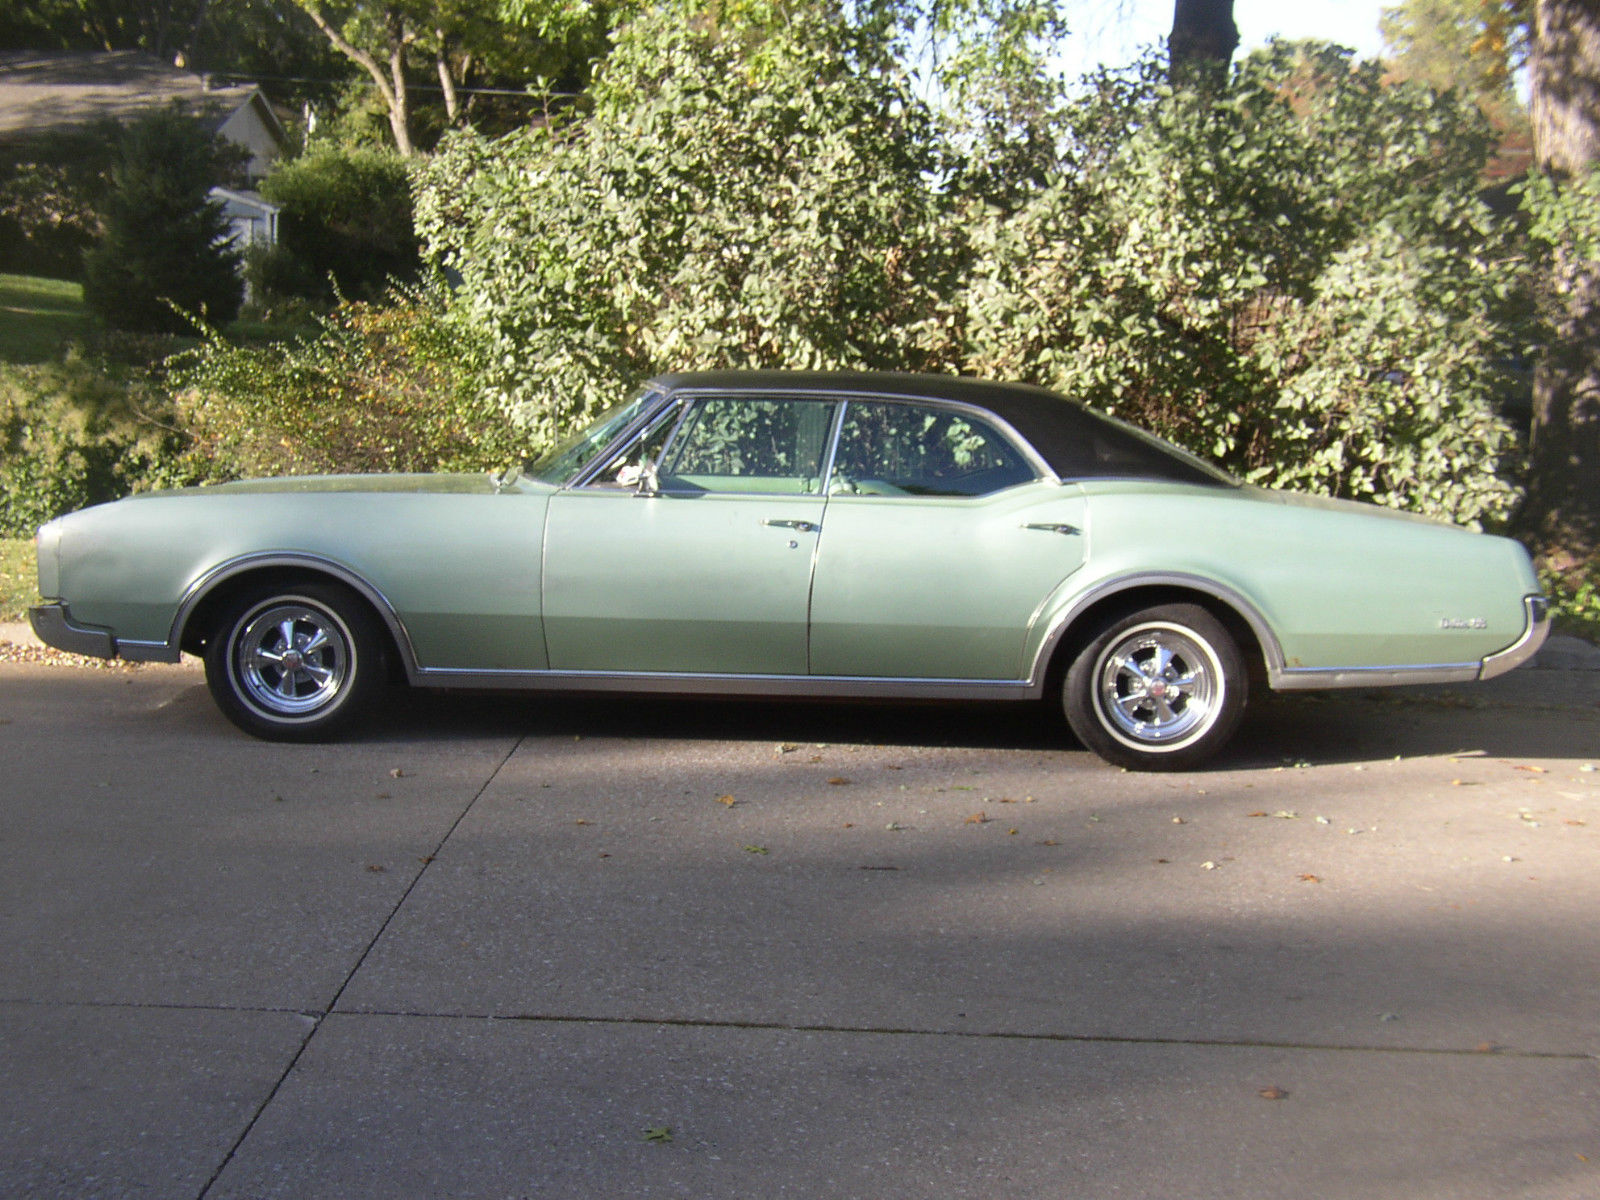 BangShiftcom eBay Find This 1967 Oldsmobile Delta 88 Is Mint